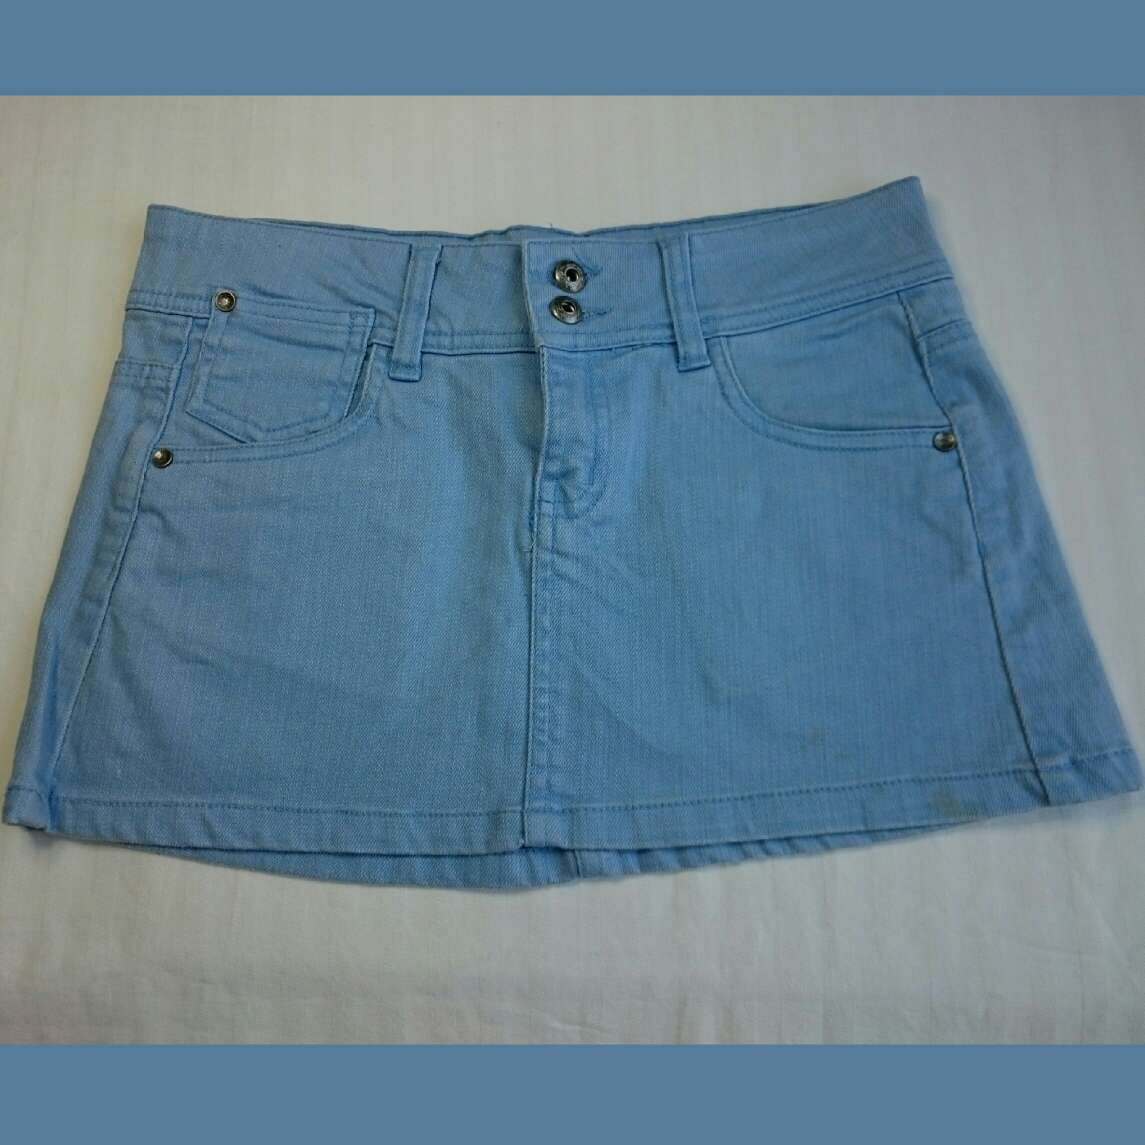 Imagen Minifalda azul pastel